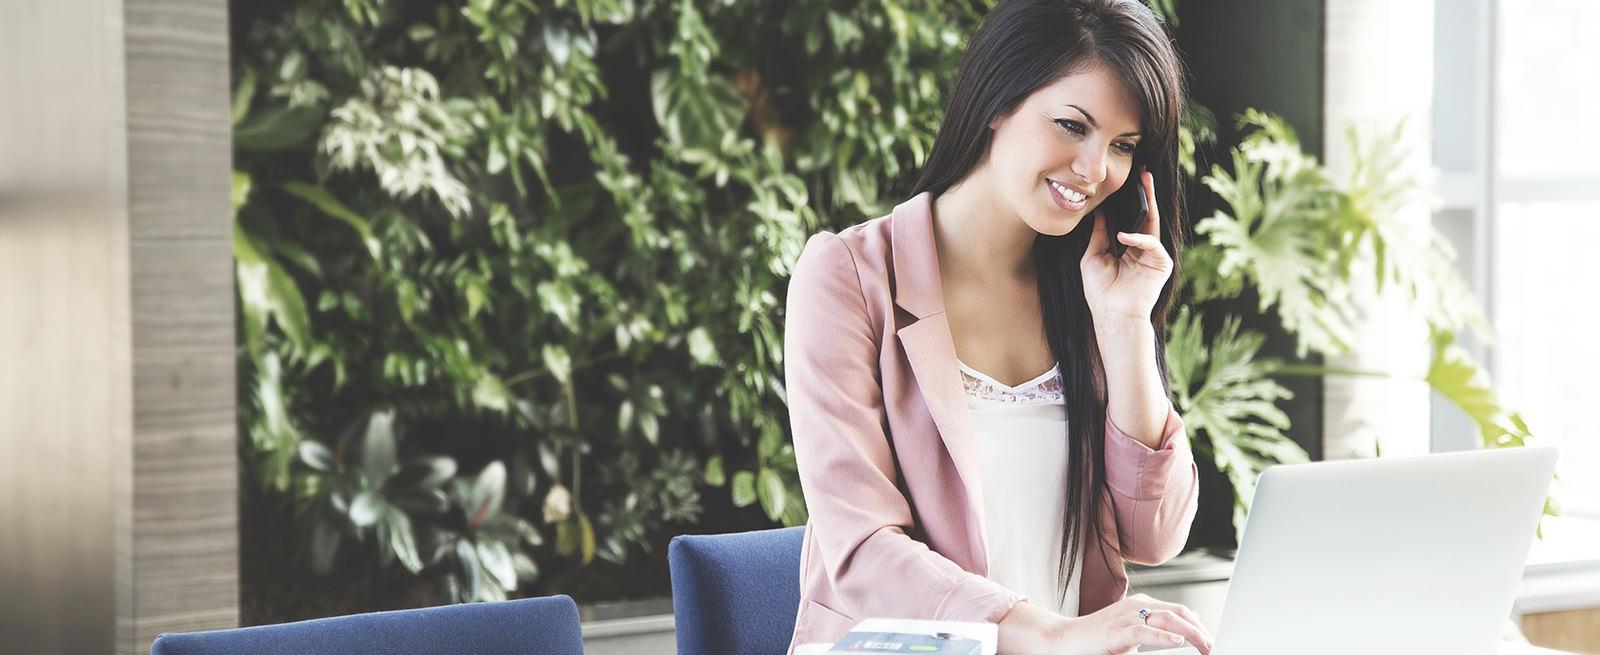 Contact | Hubsys, Conseillers en Gestion de Patrimoine